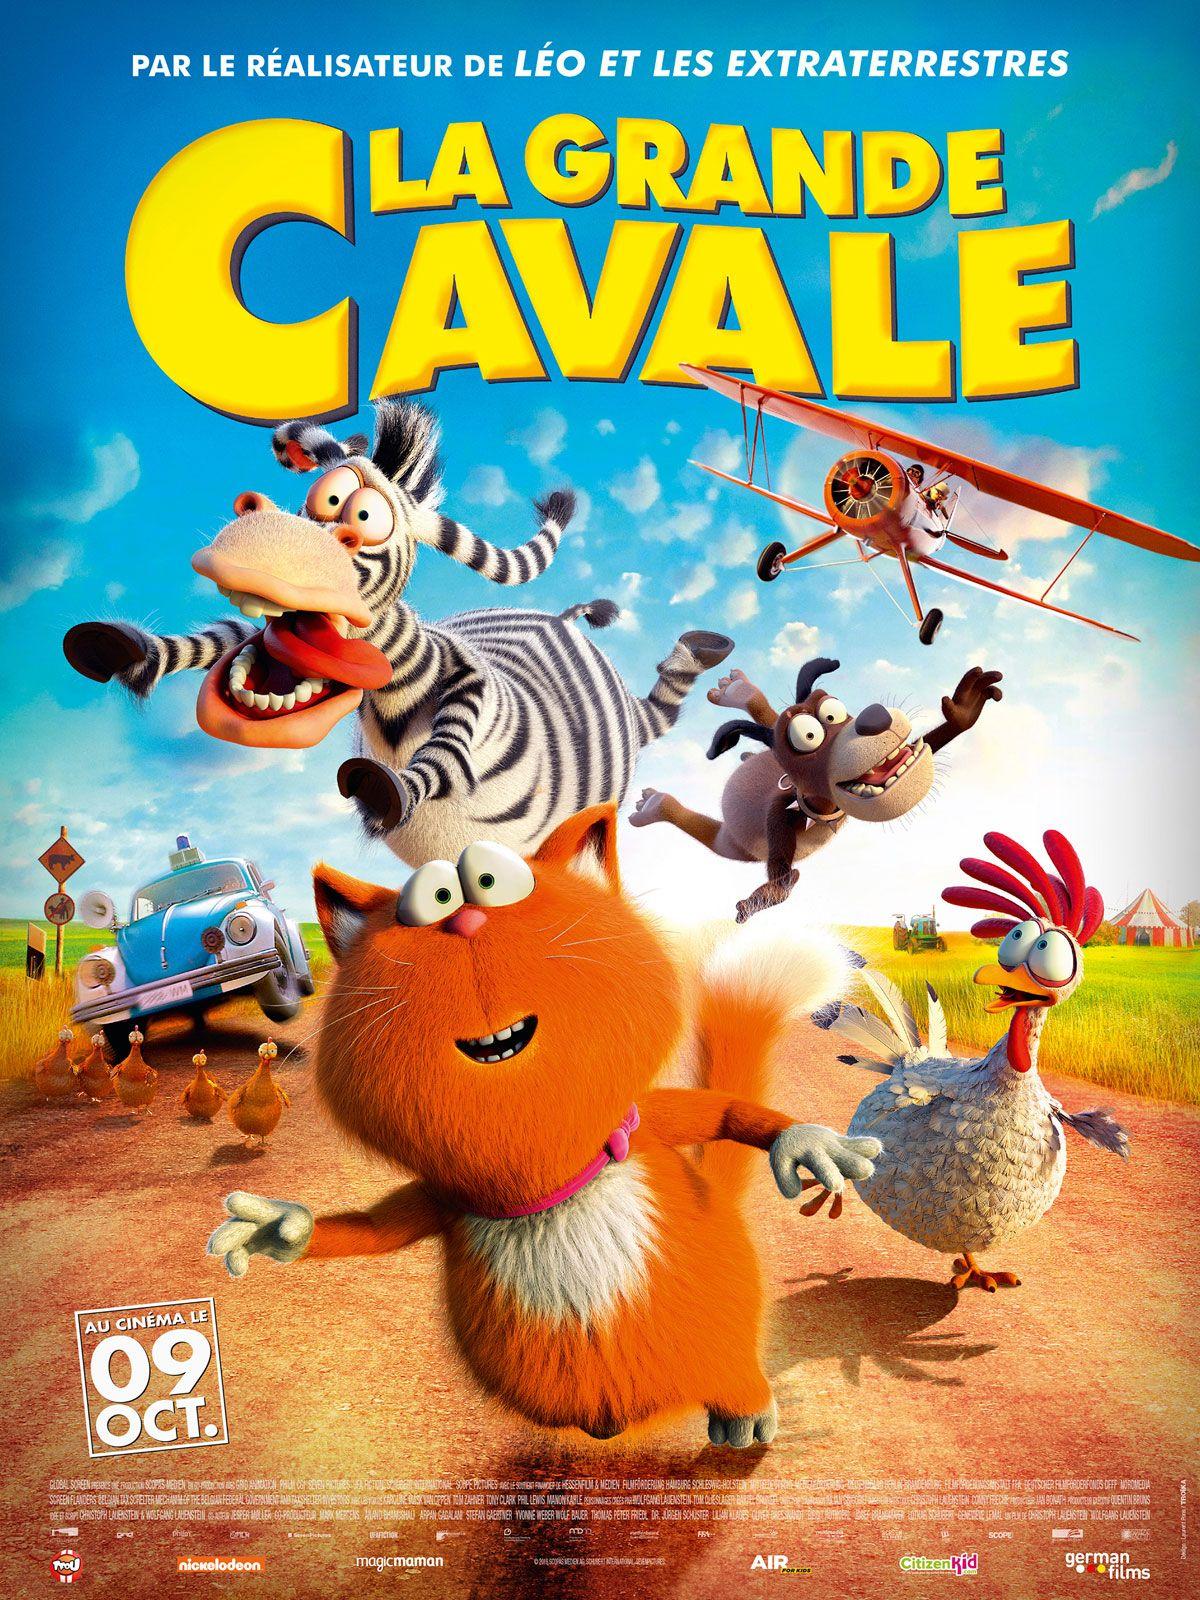 La Grande Cavale Film 2019 Senscritique